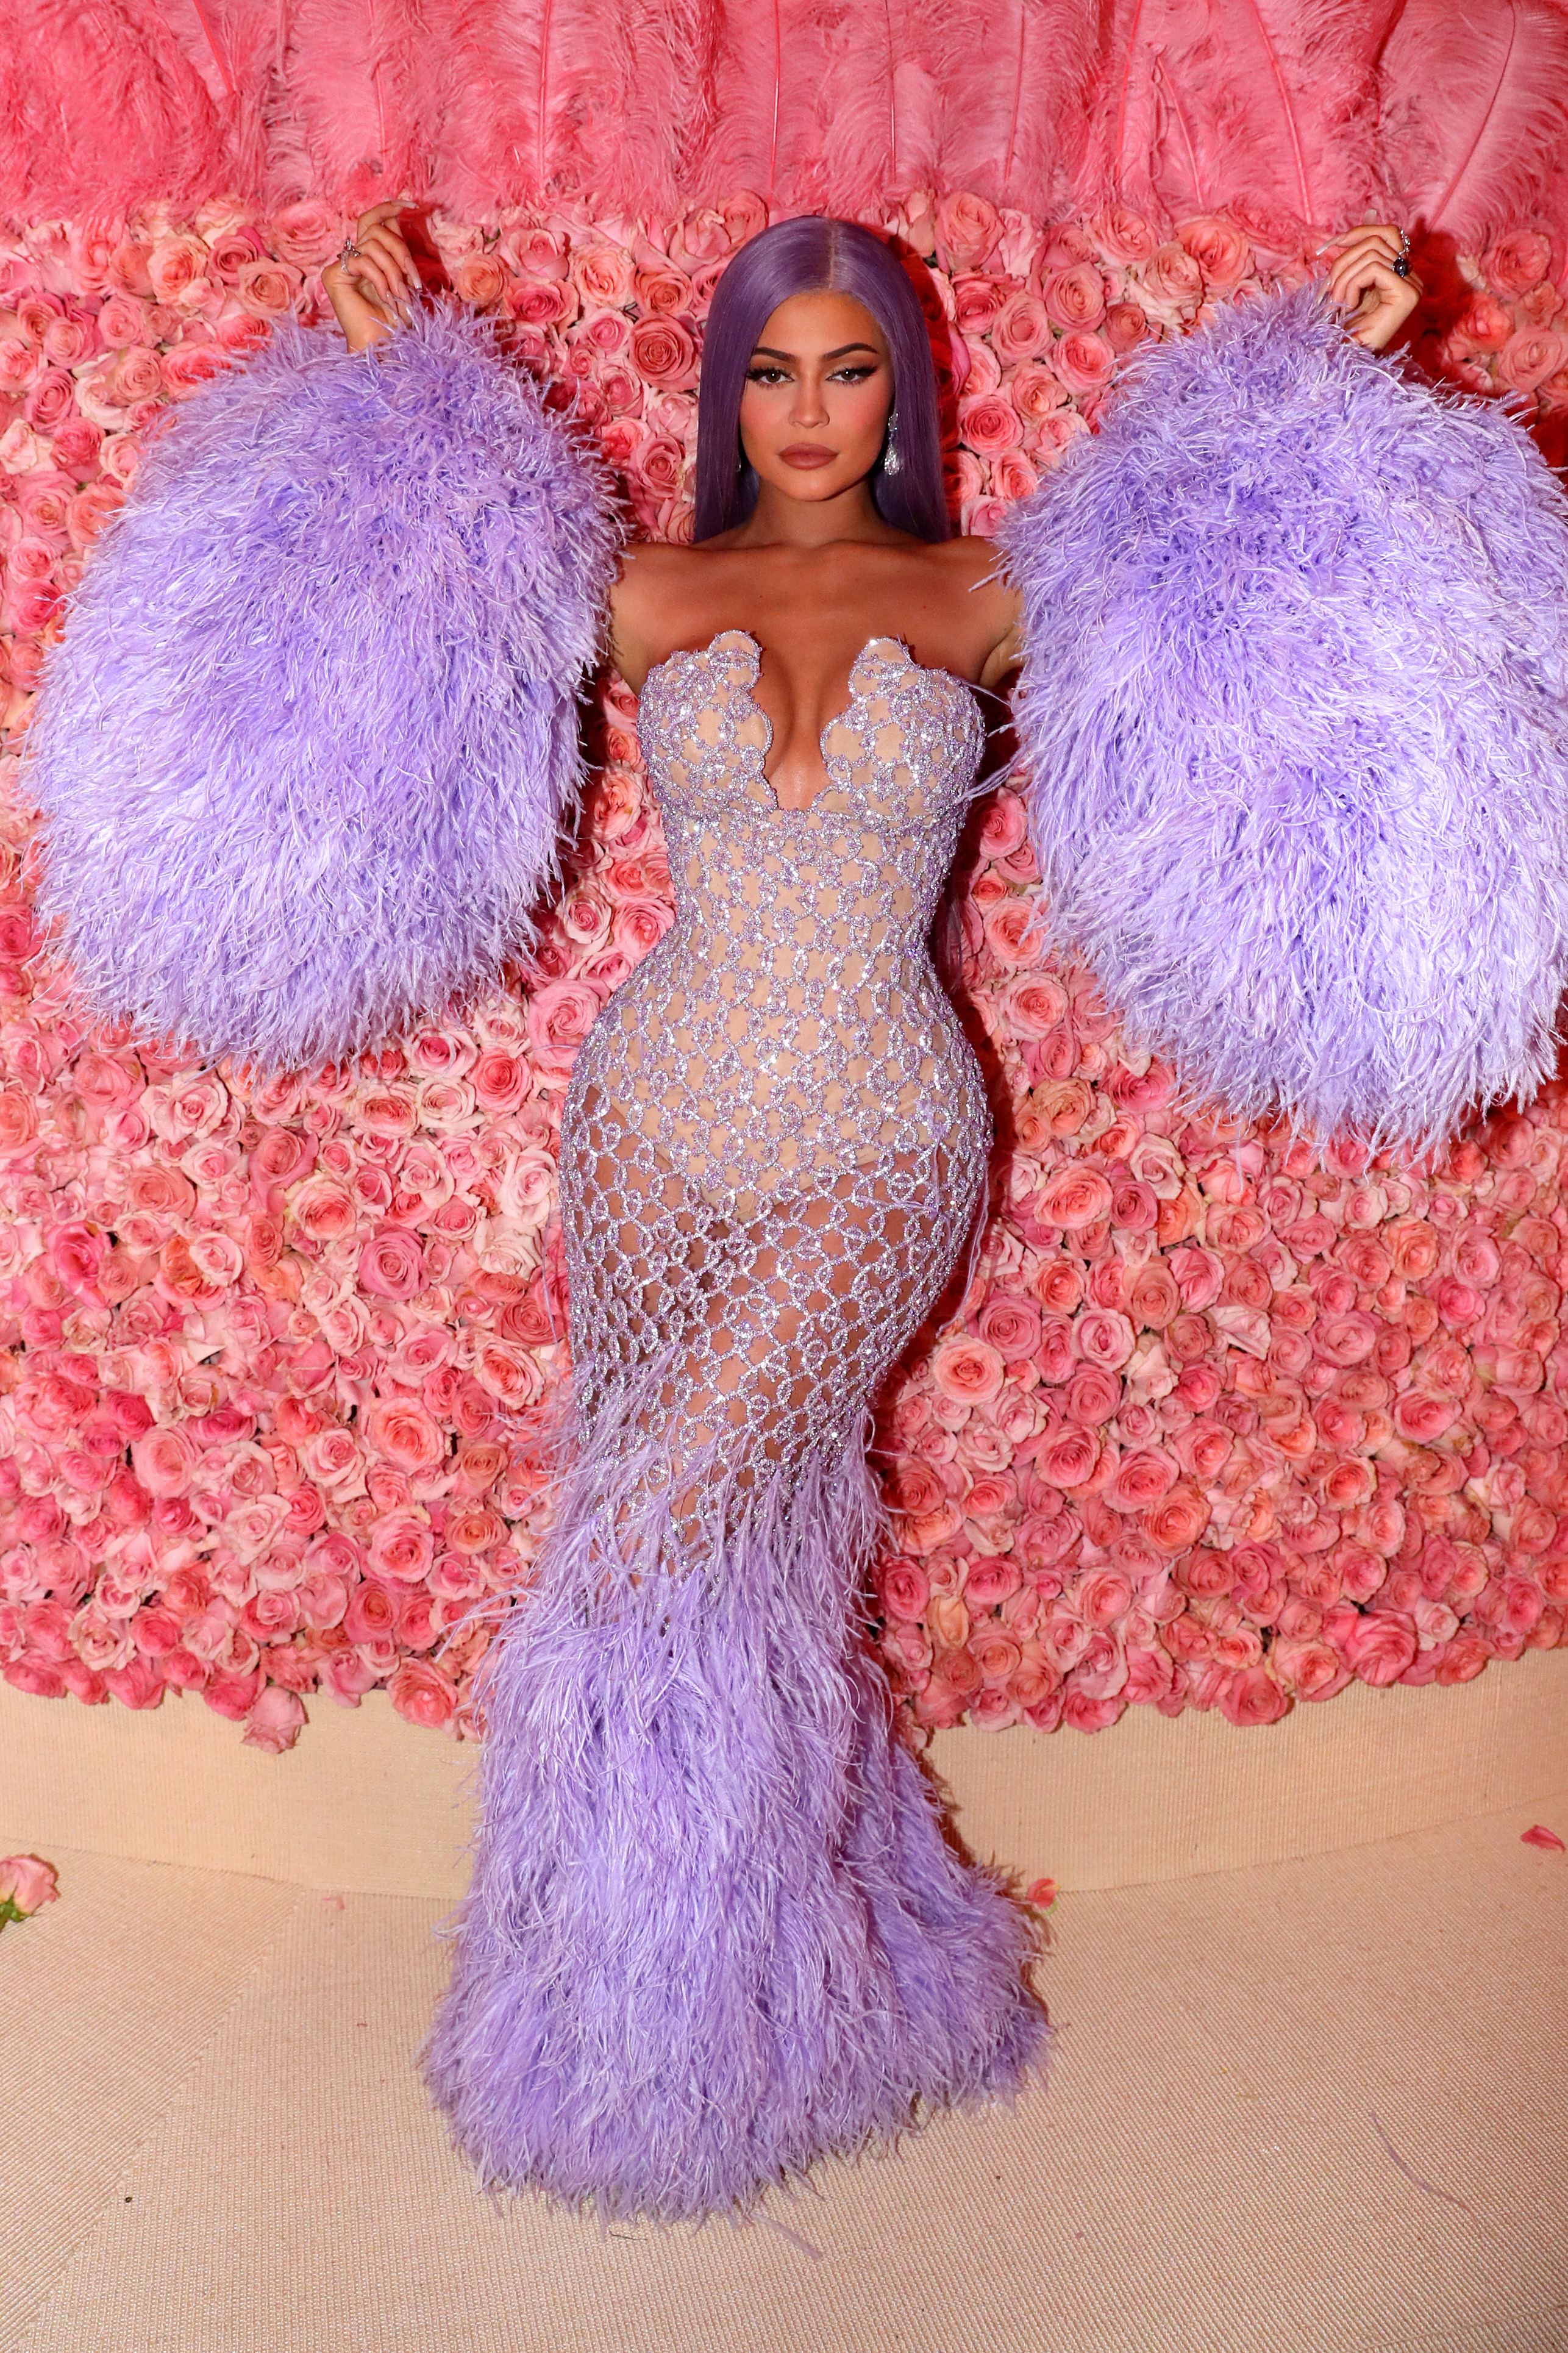 Kylie Jenner, cuerpo, cinturita